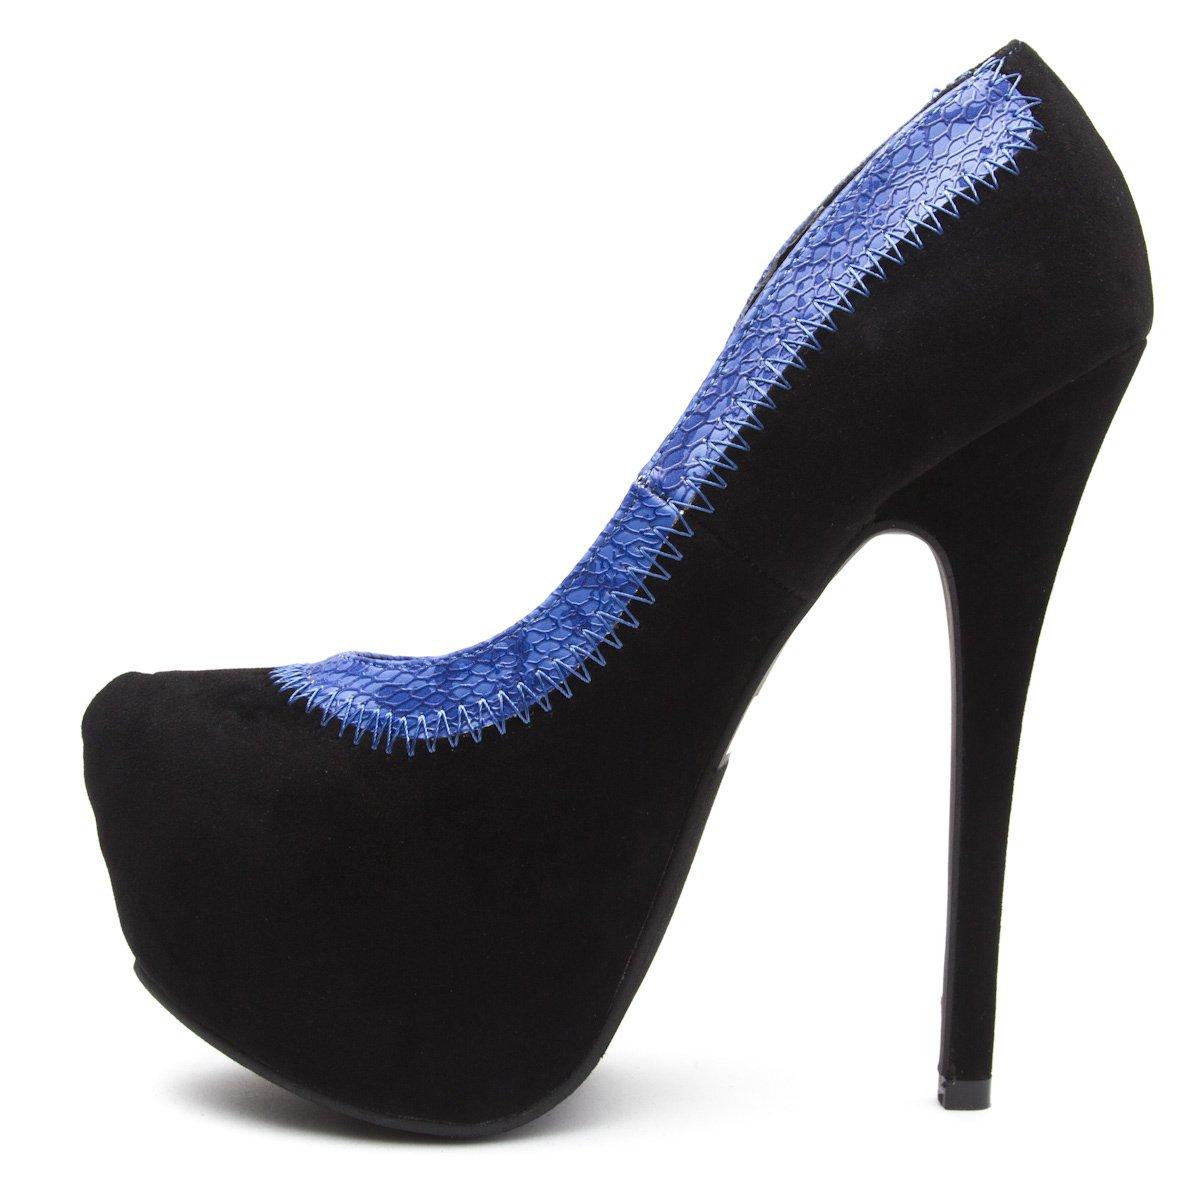 Styluxe Womens ARCHE Almond Toe Platform High Heel Stiletto Pump